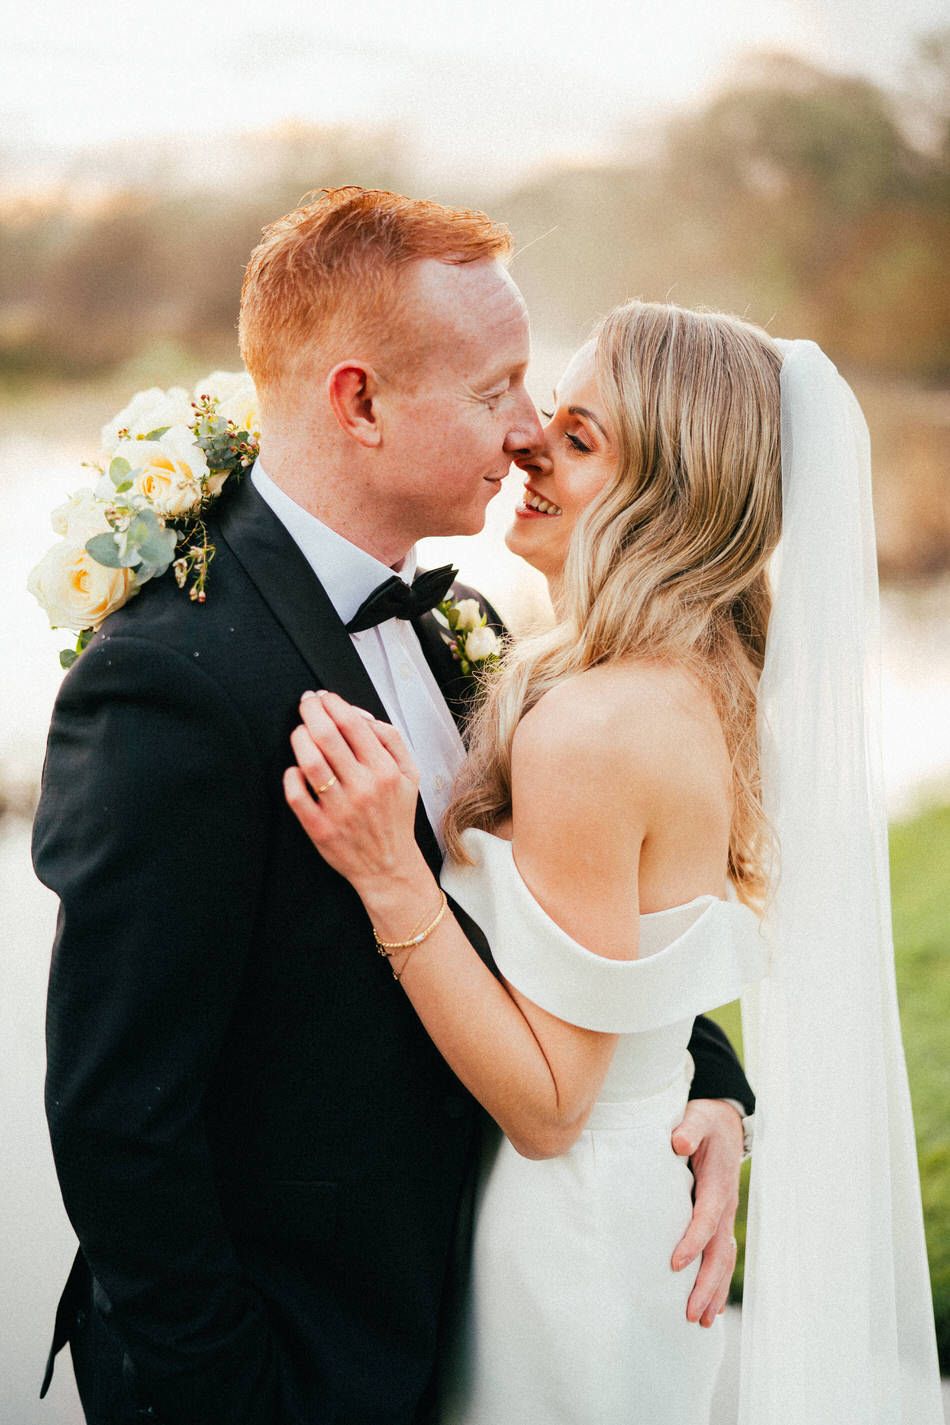 Castle-wedding-ireland-photos- 0224 164